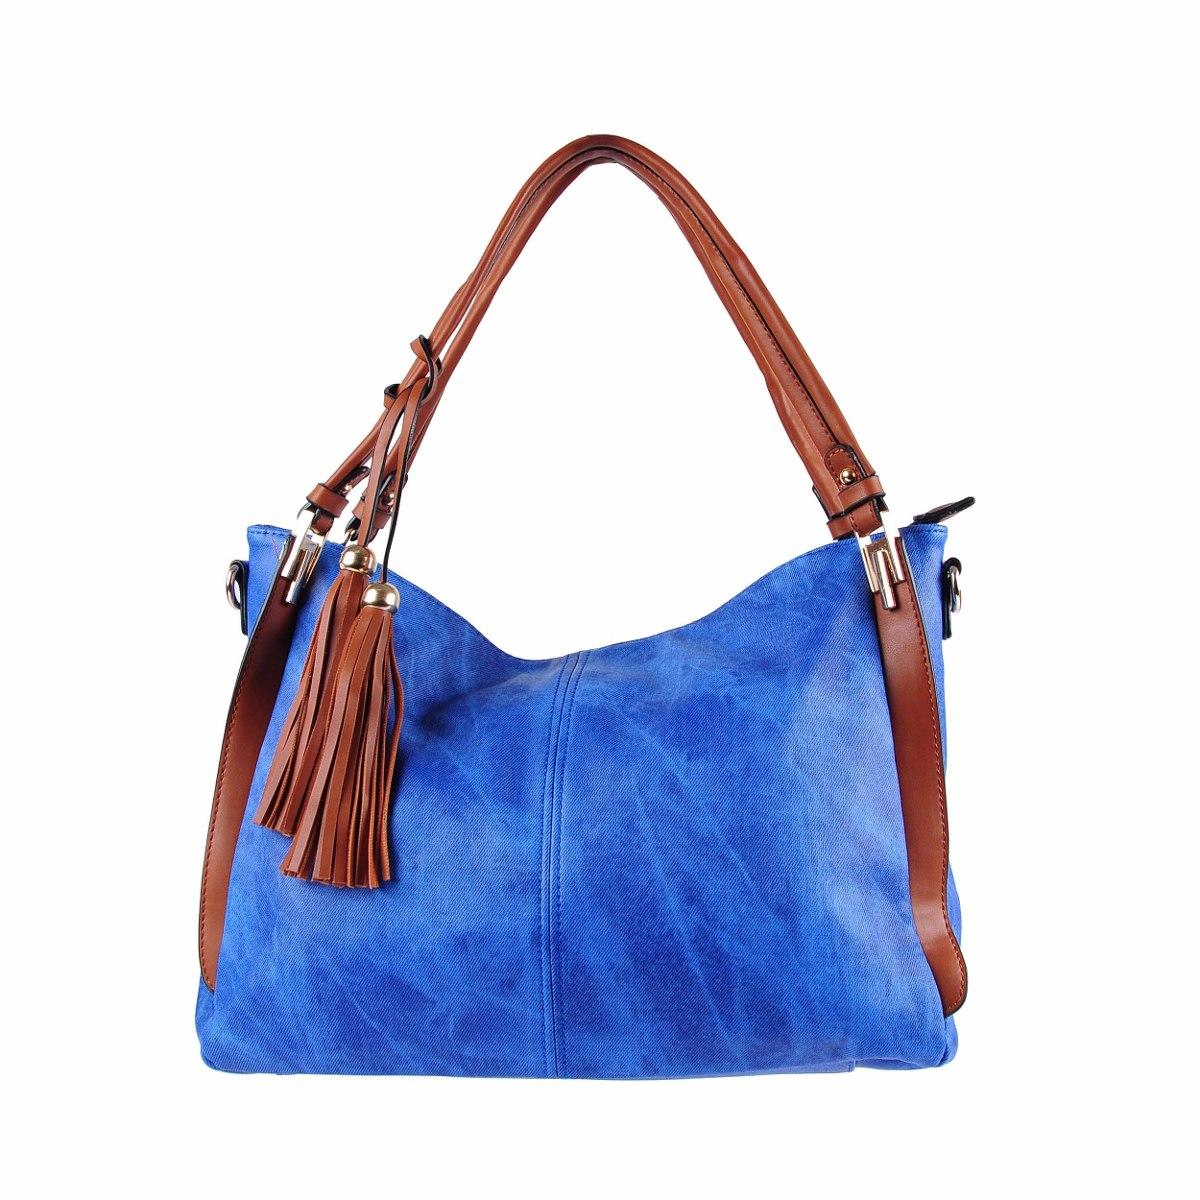 c31c38fe9 bolsa saco feminina importada imitar jeans mc borboleta azul. Carregando  zoom.